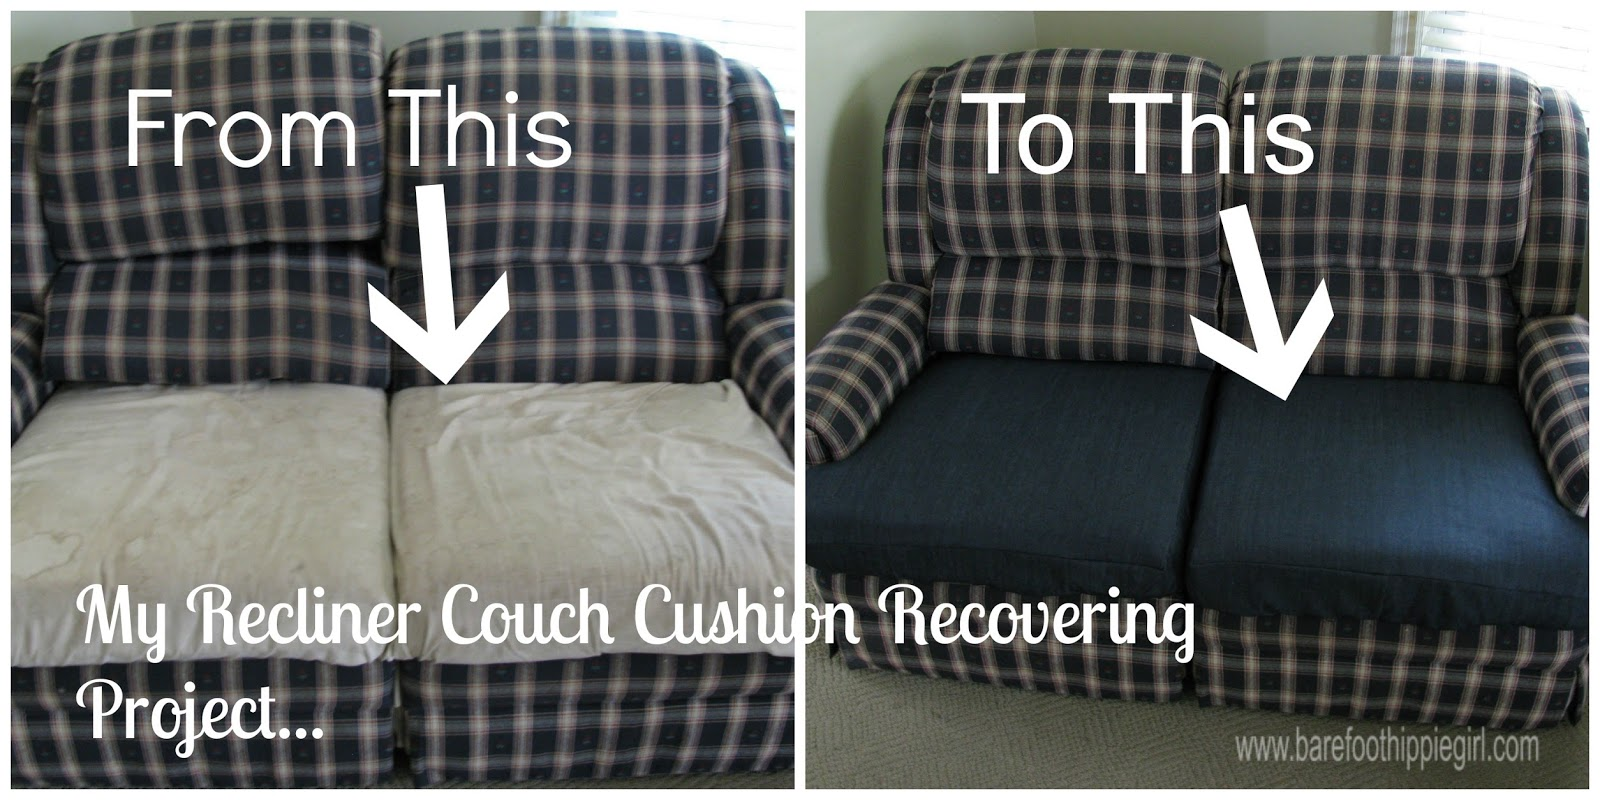 King Sofa Recover Cushions